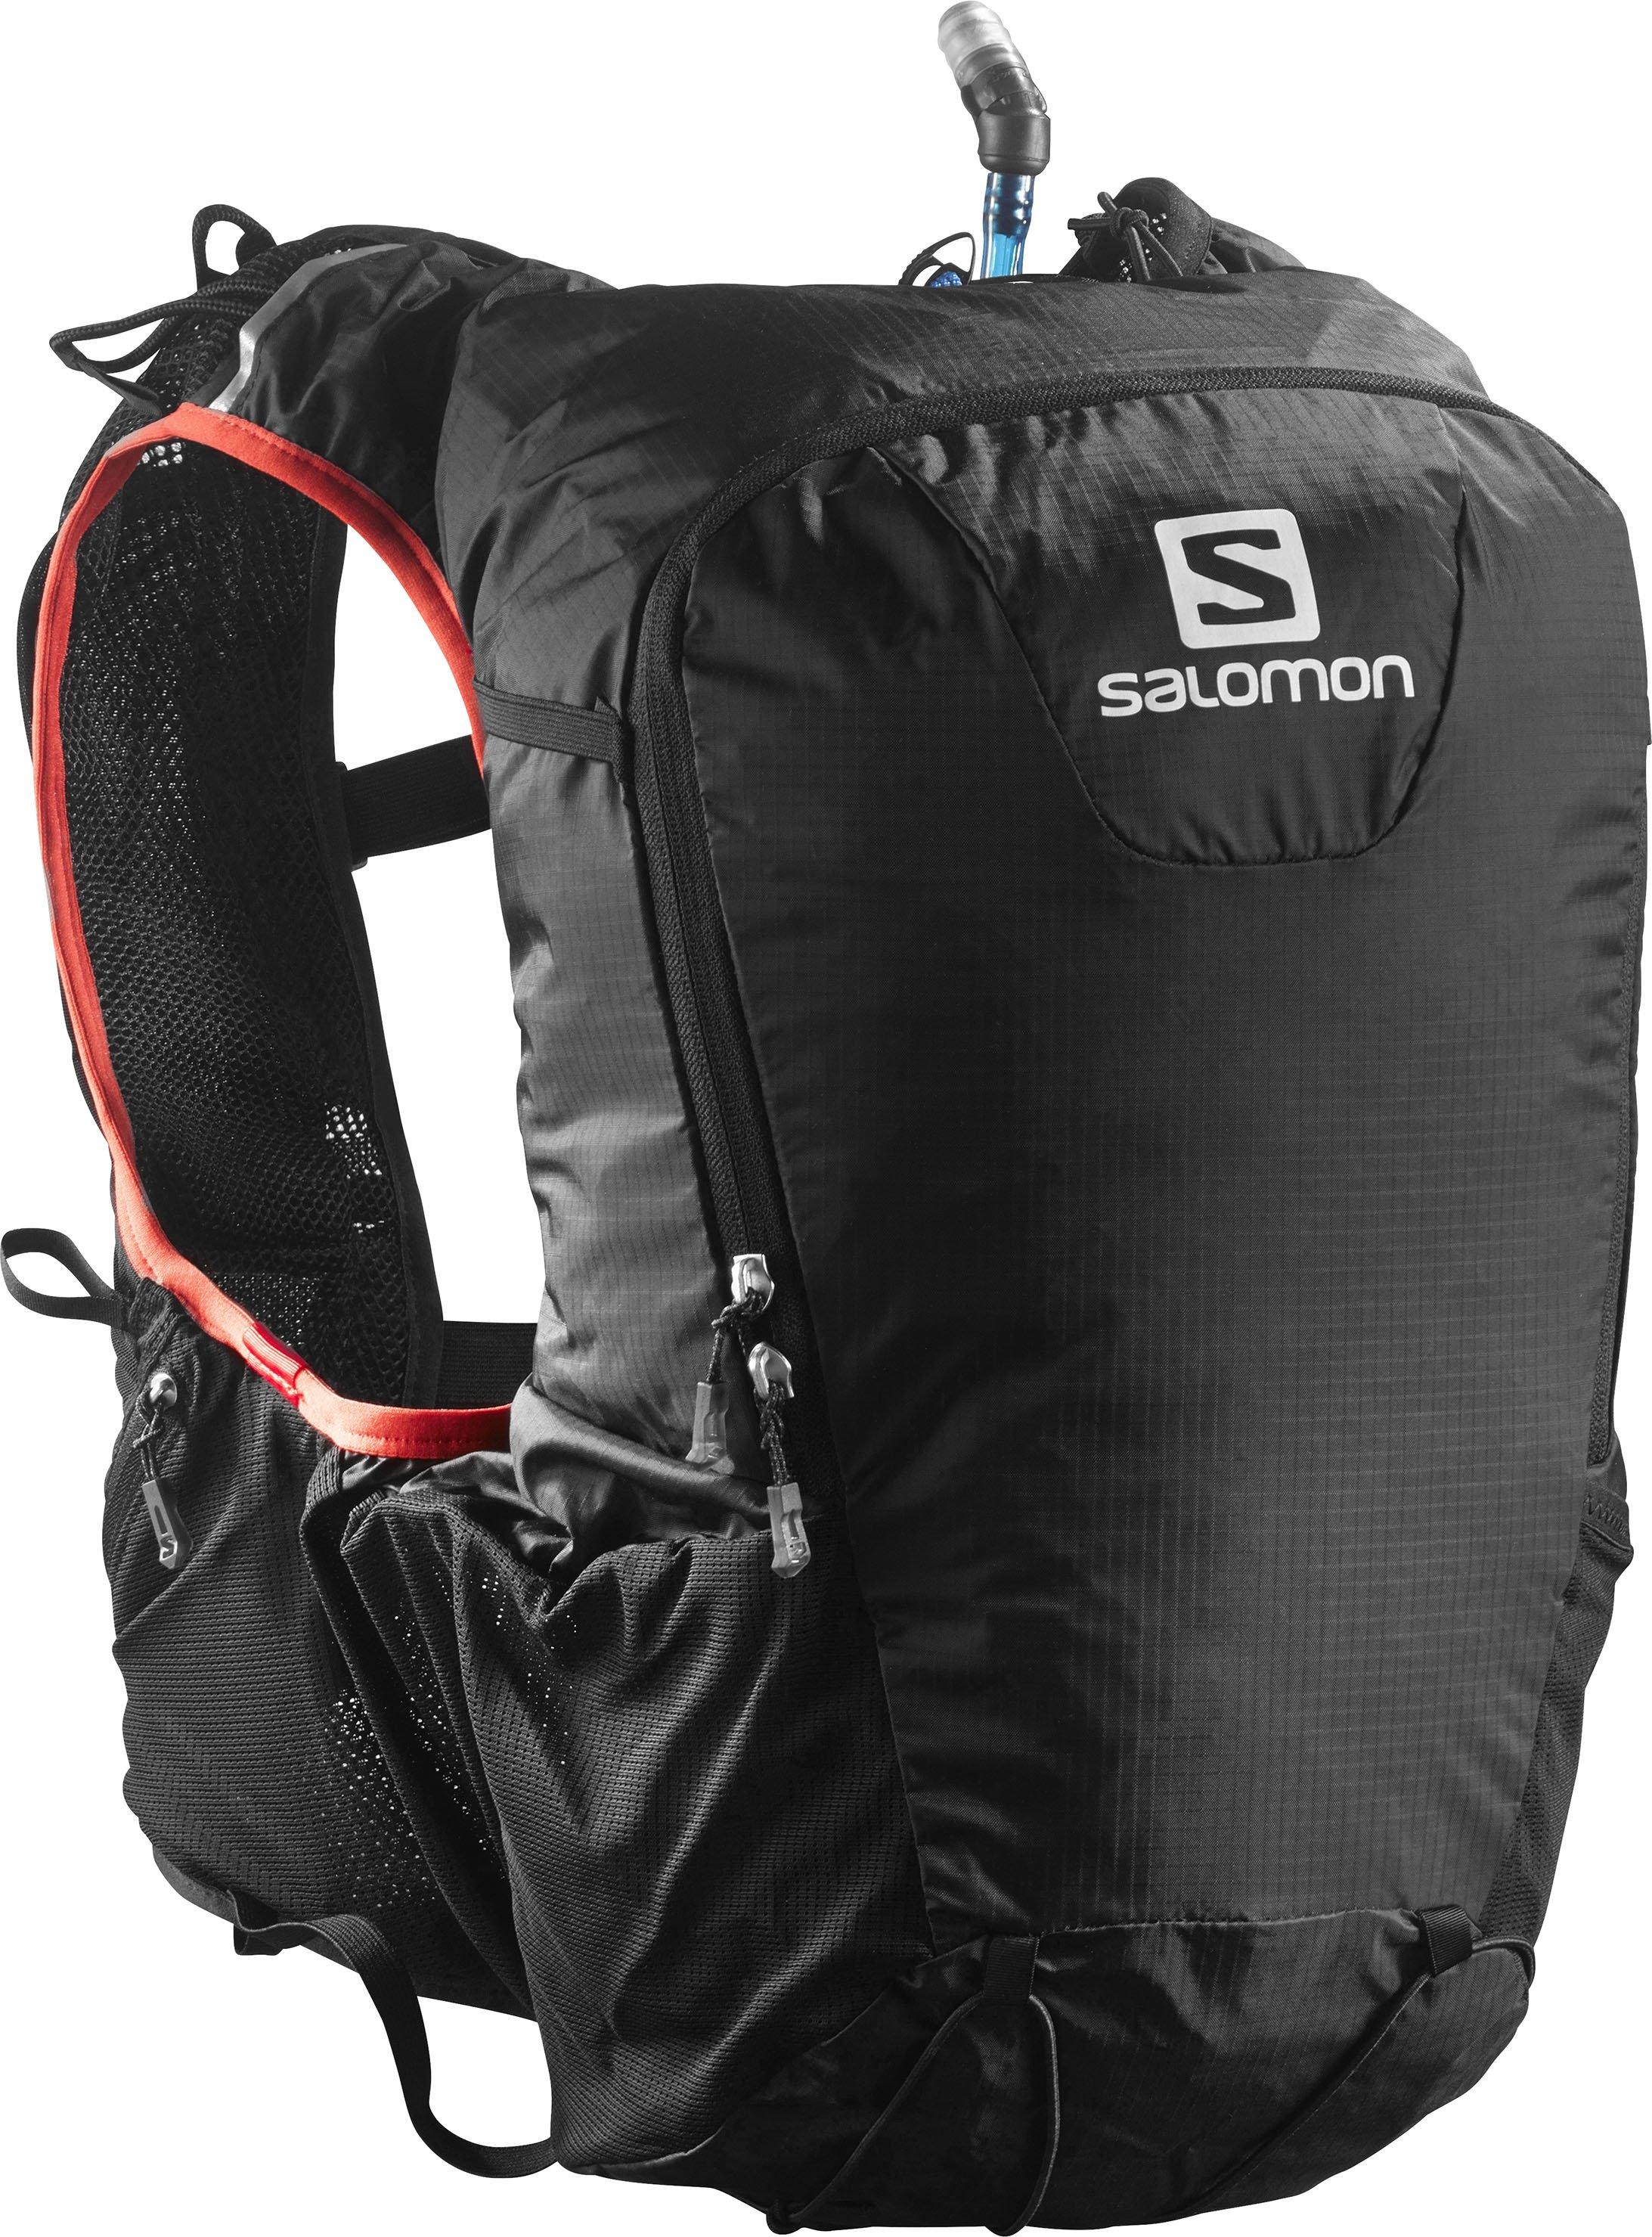 Batoh Salomon Skin Pro 15